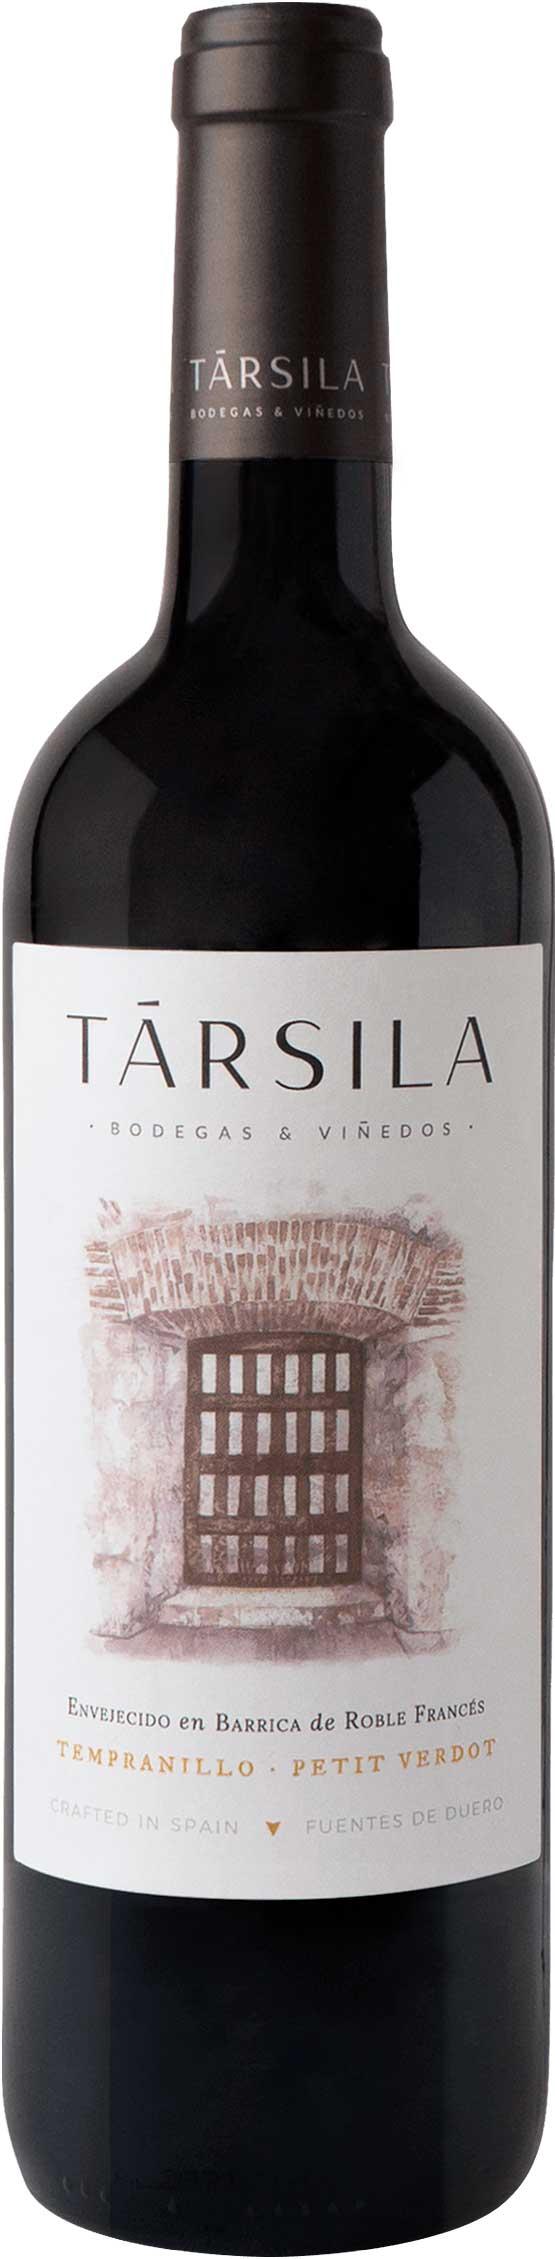 tarsila-6-months-petit-verdot-tempranillo.jpg